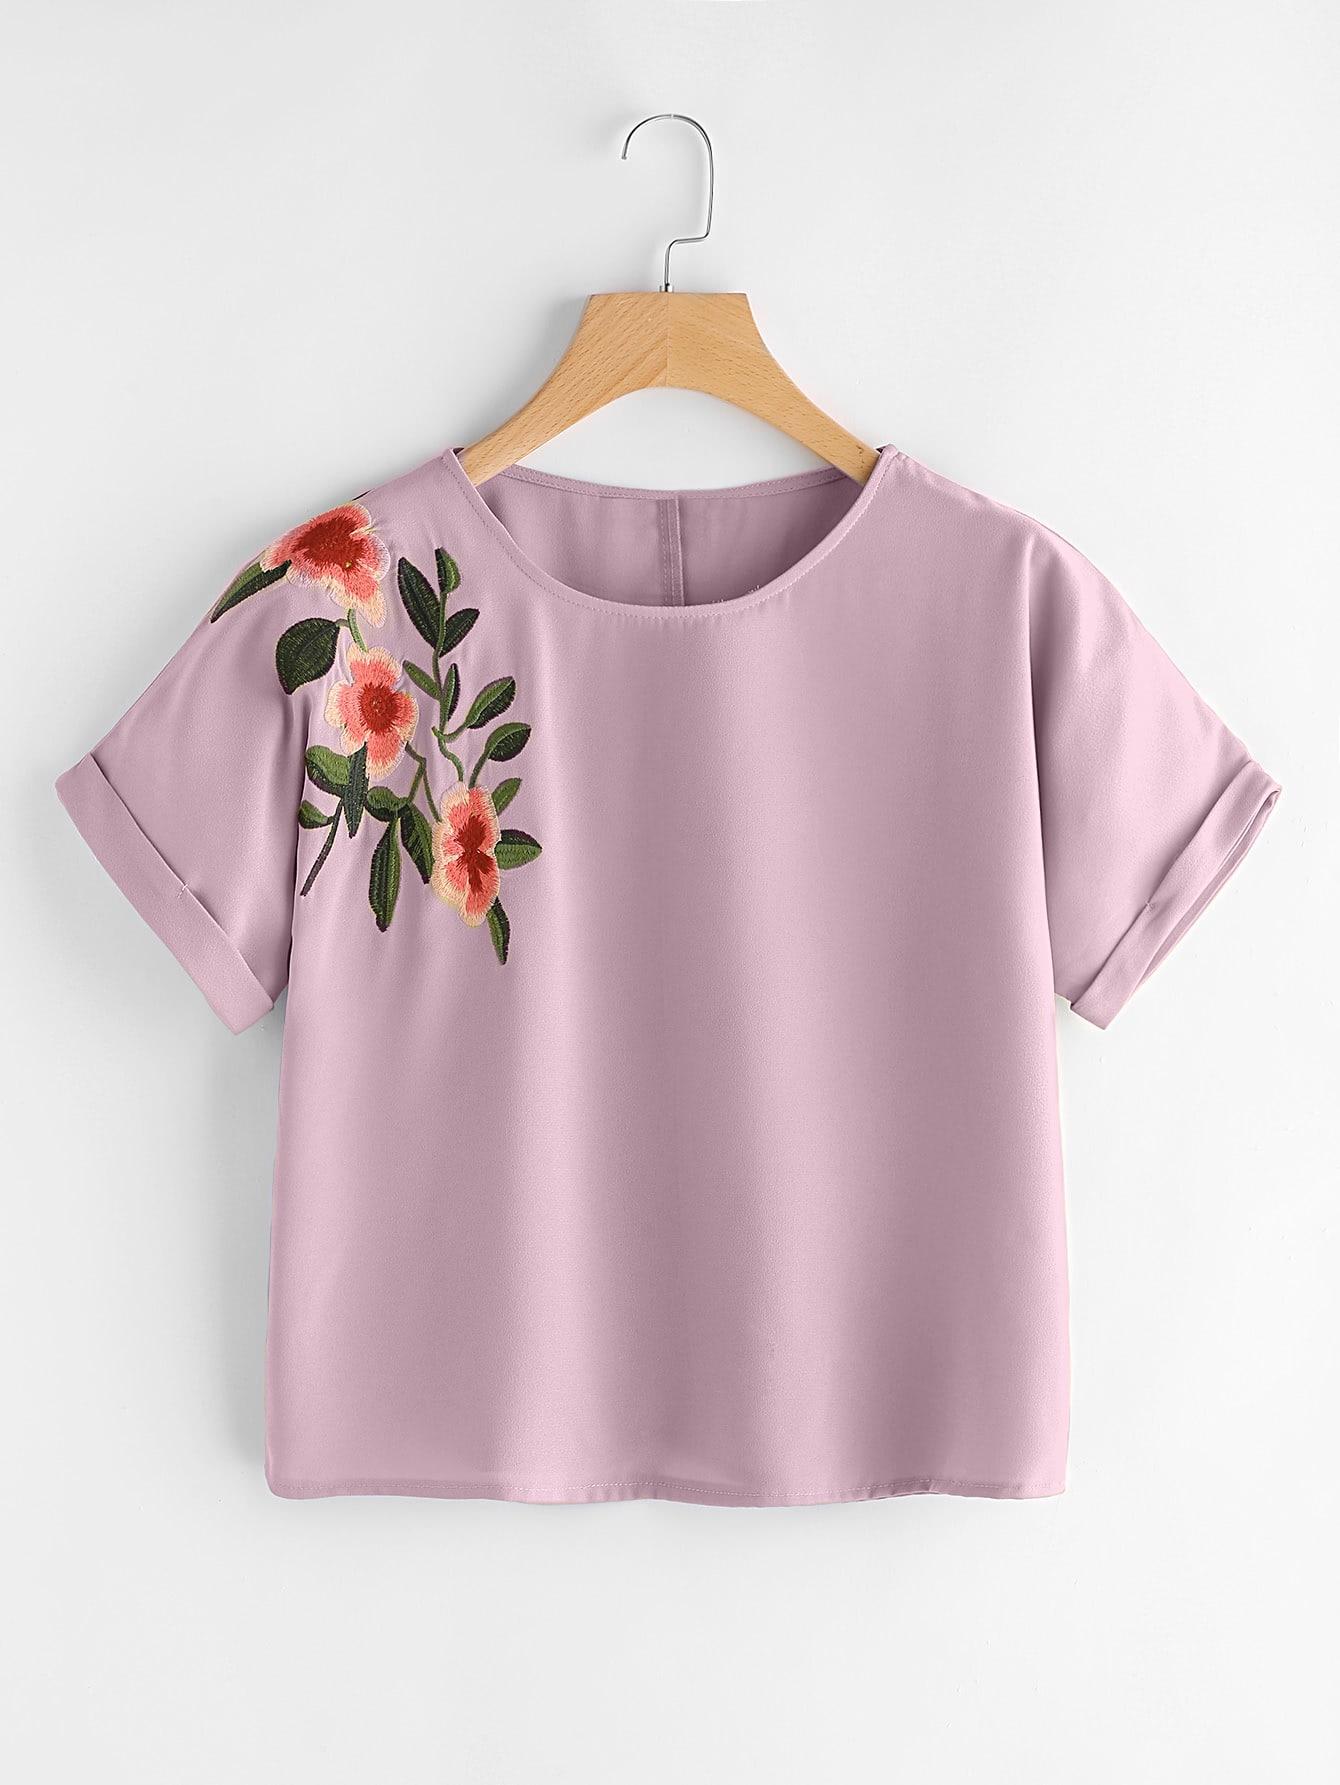 Фото Flower Embroidered Cuffed Sleeve Top. Купить с доставкой